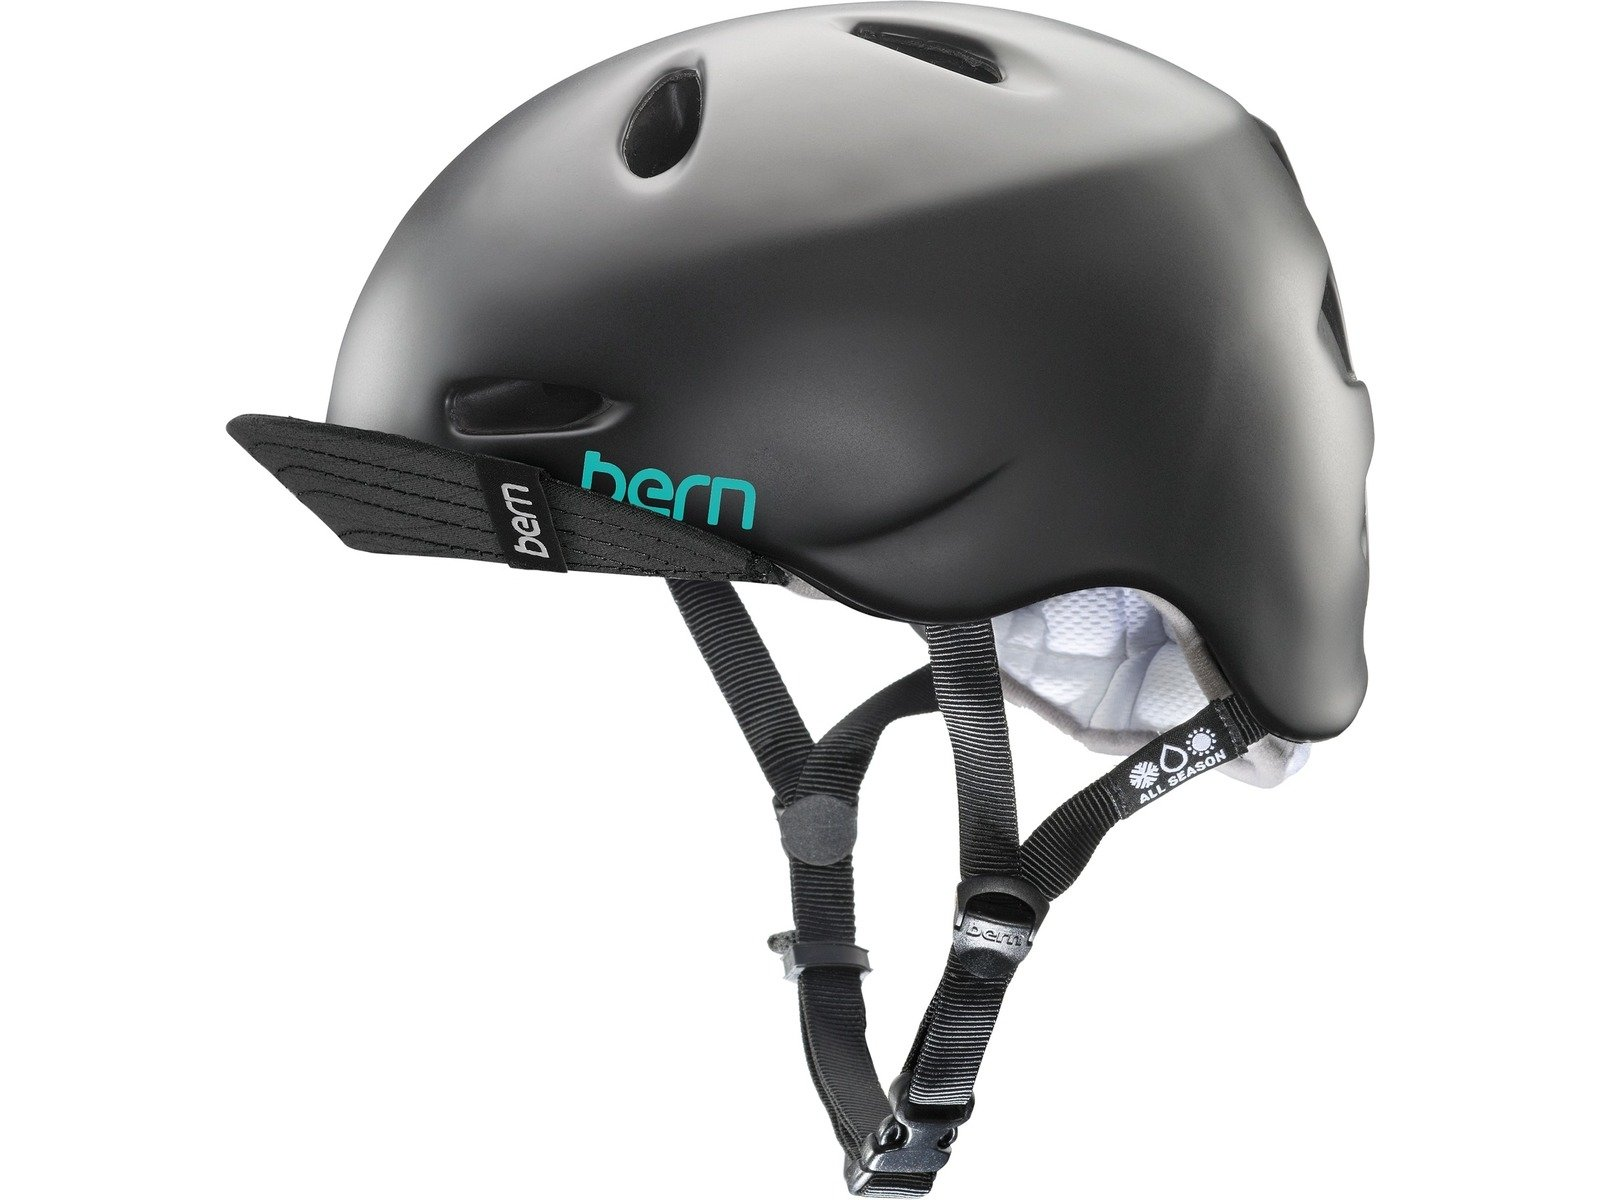 BERN Unlimited Berkeley Summer Helmet with Visor, Satin Black, Medium/Large